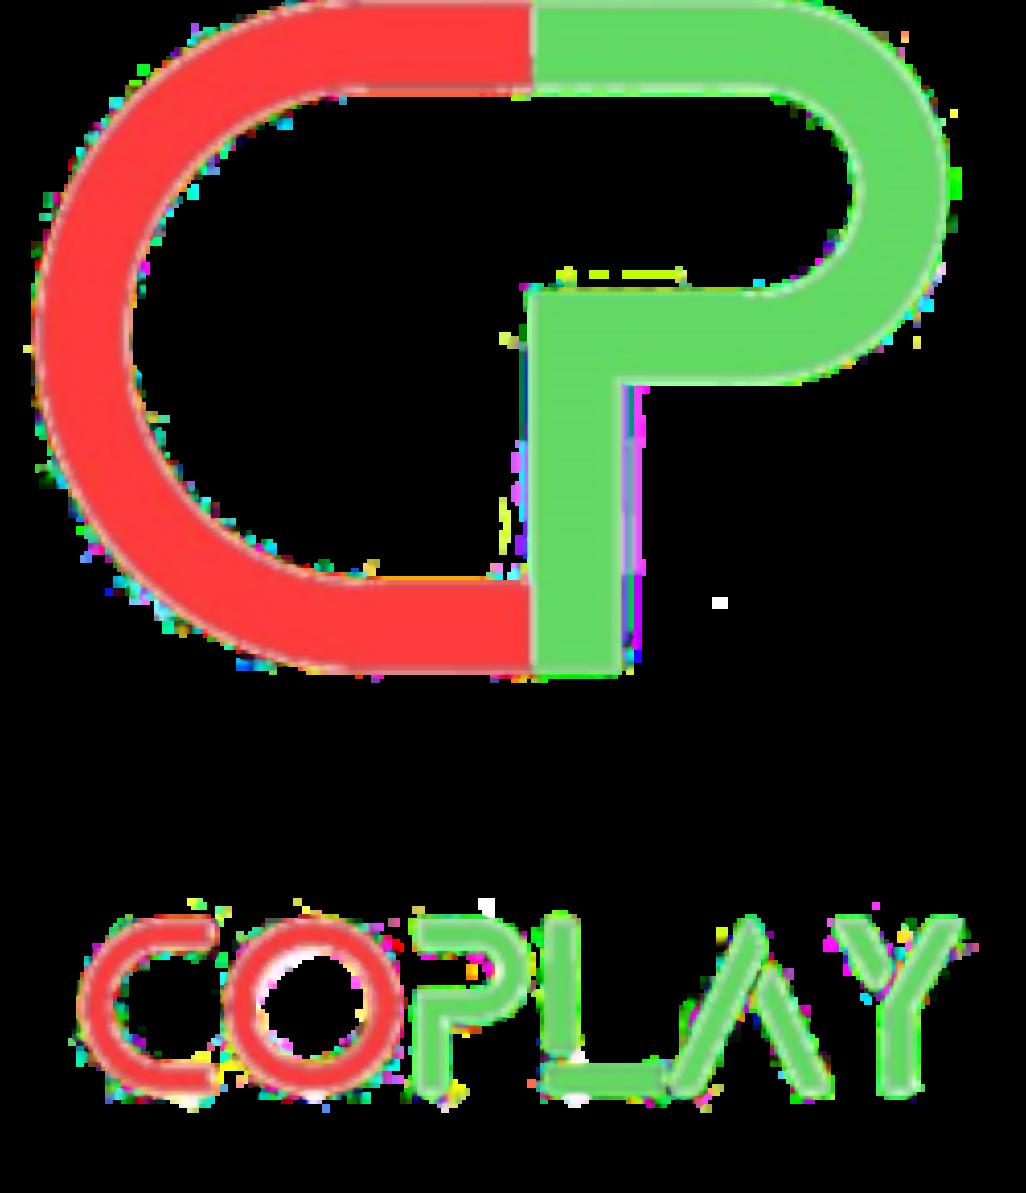 CoPlay